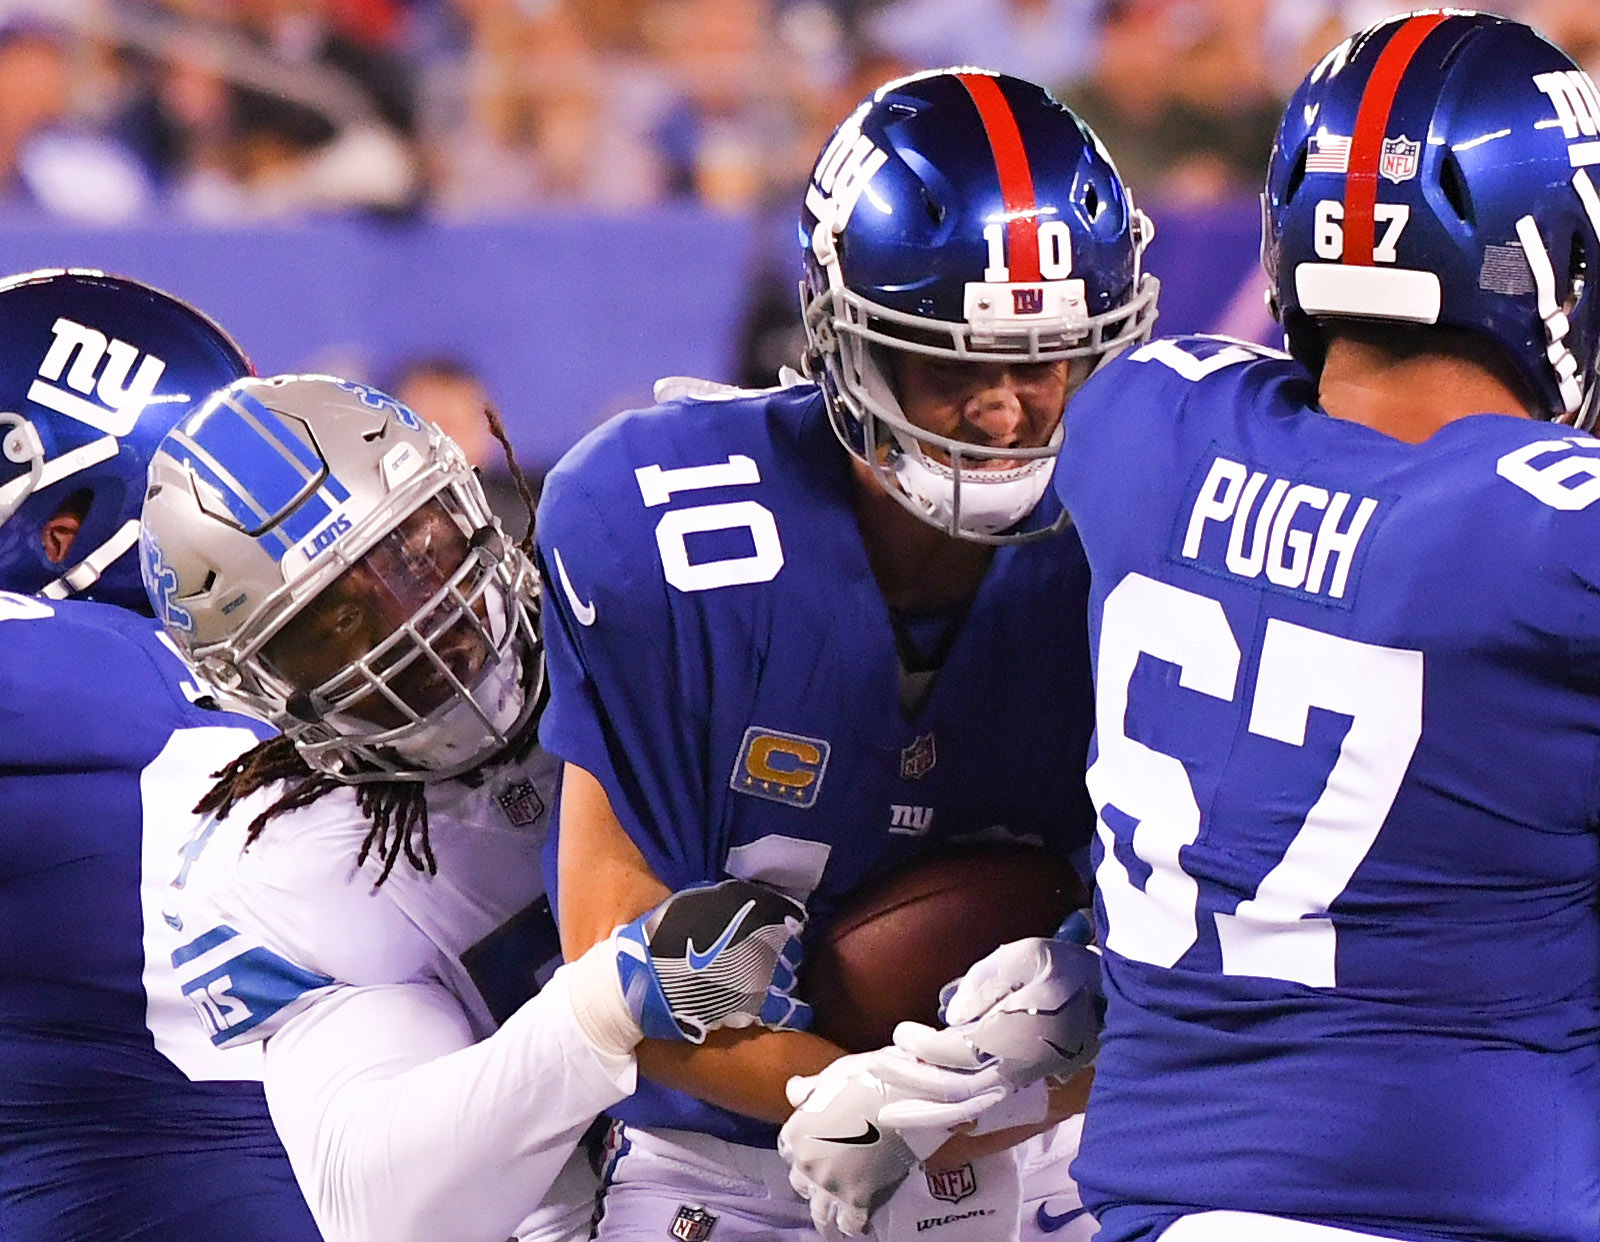 NFL: Detroit Lions at New York Giants